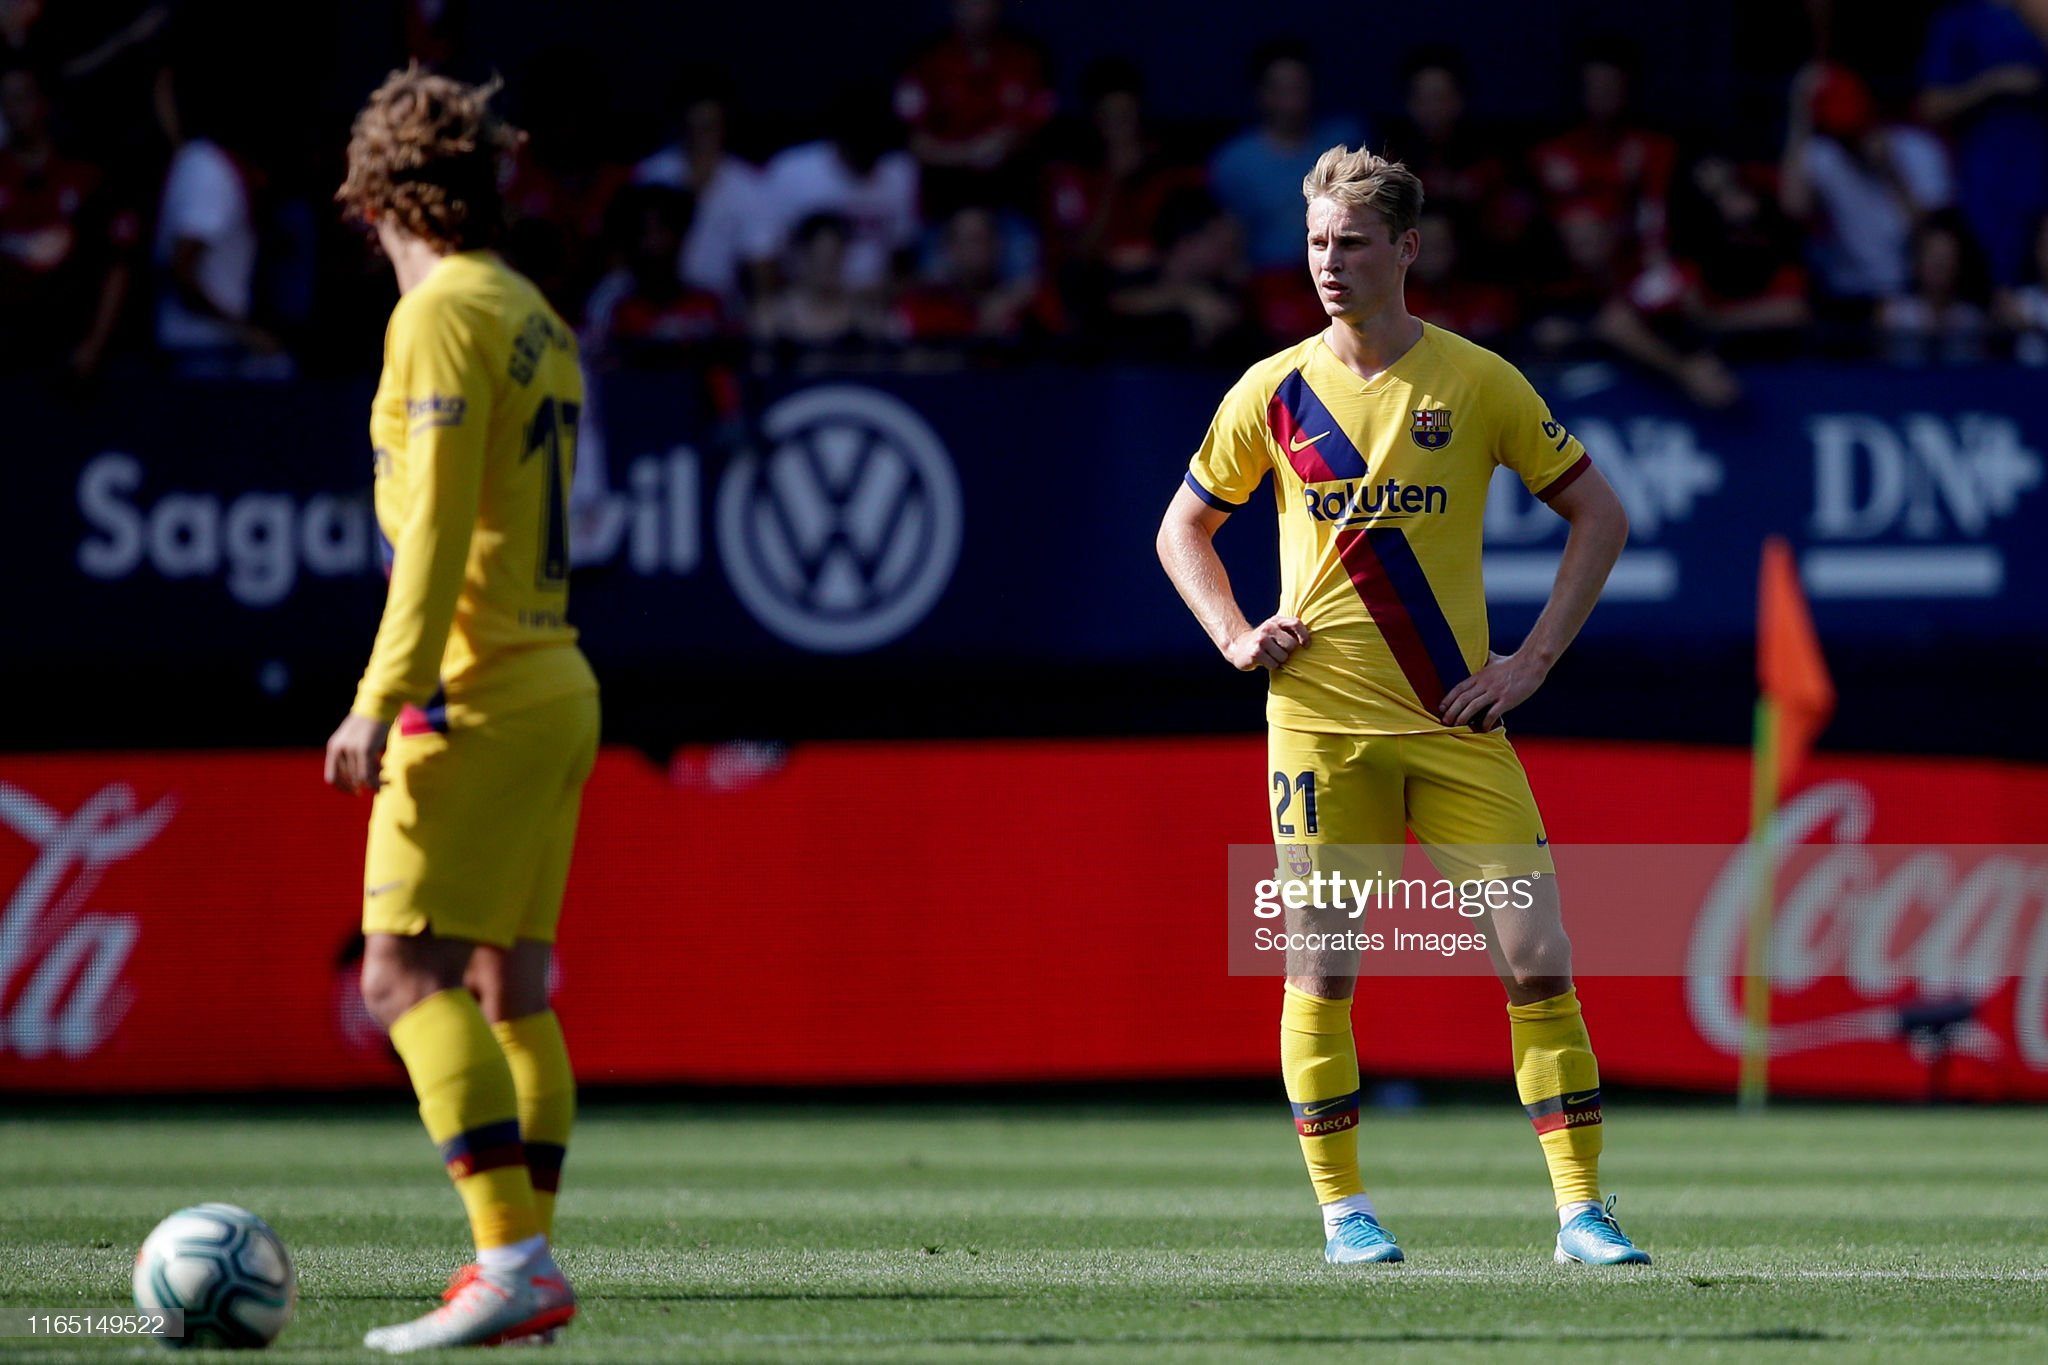 صور مباراة : أوساسونا - برشلونة 2-2 ( 31-08-2019 )  Frenkie-de-jong-of-fc-barcelona-during-the-la-liga-santander-match-picture-id1165149522?s=2048x2048